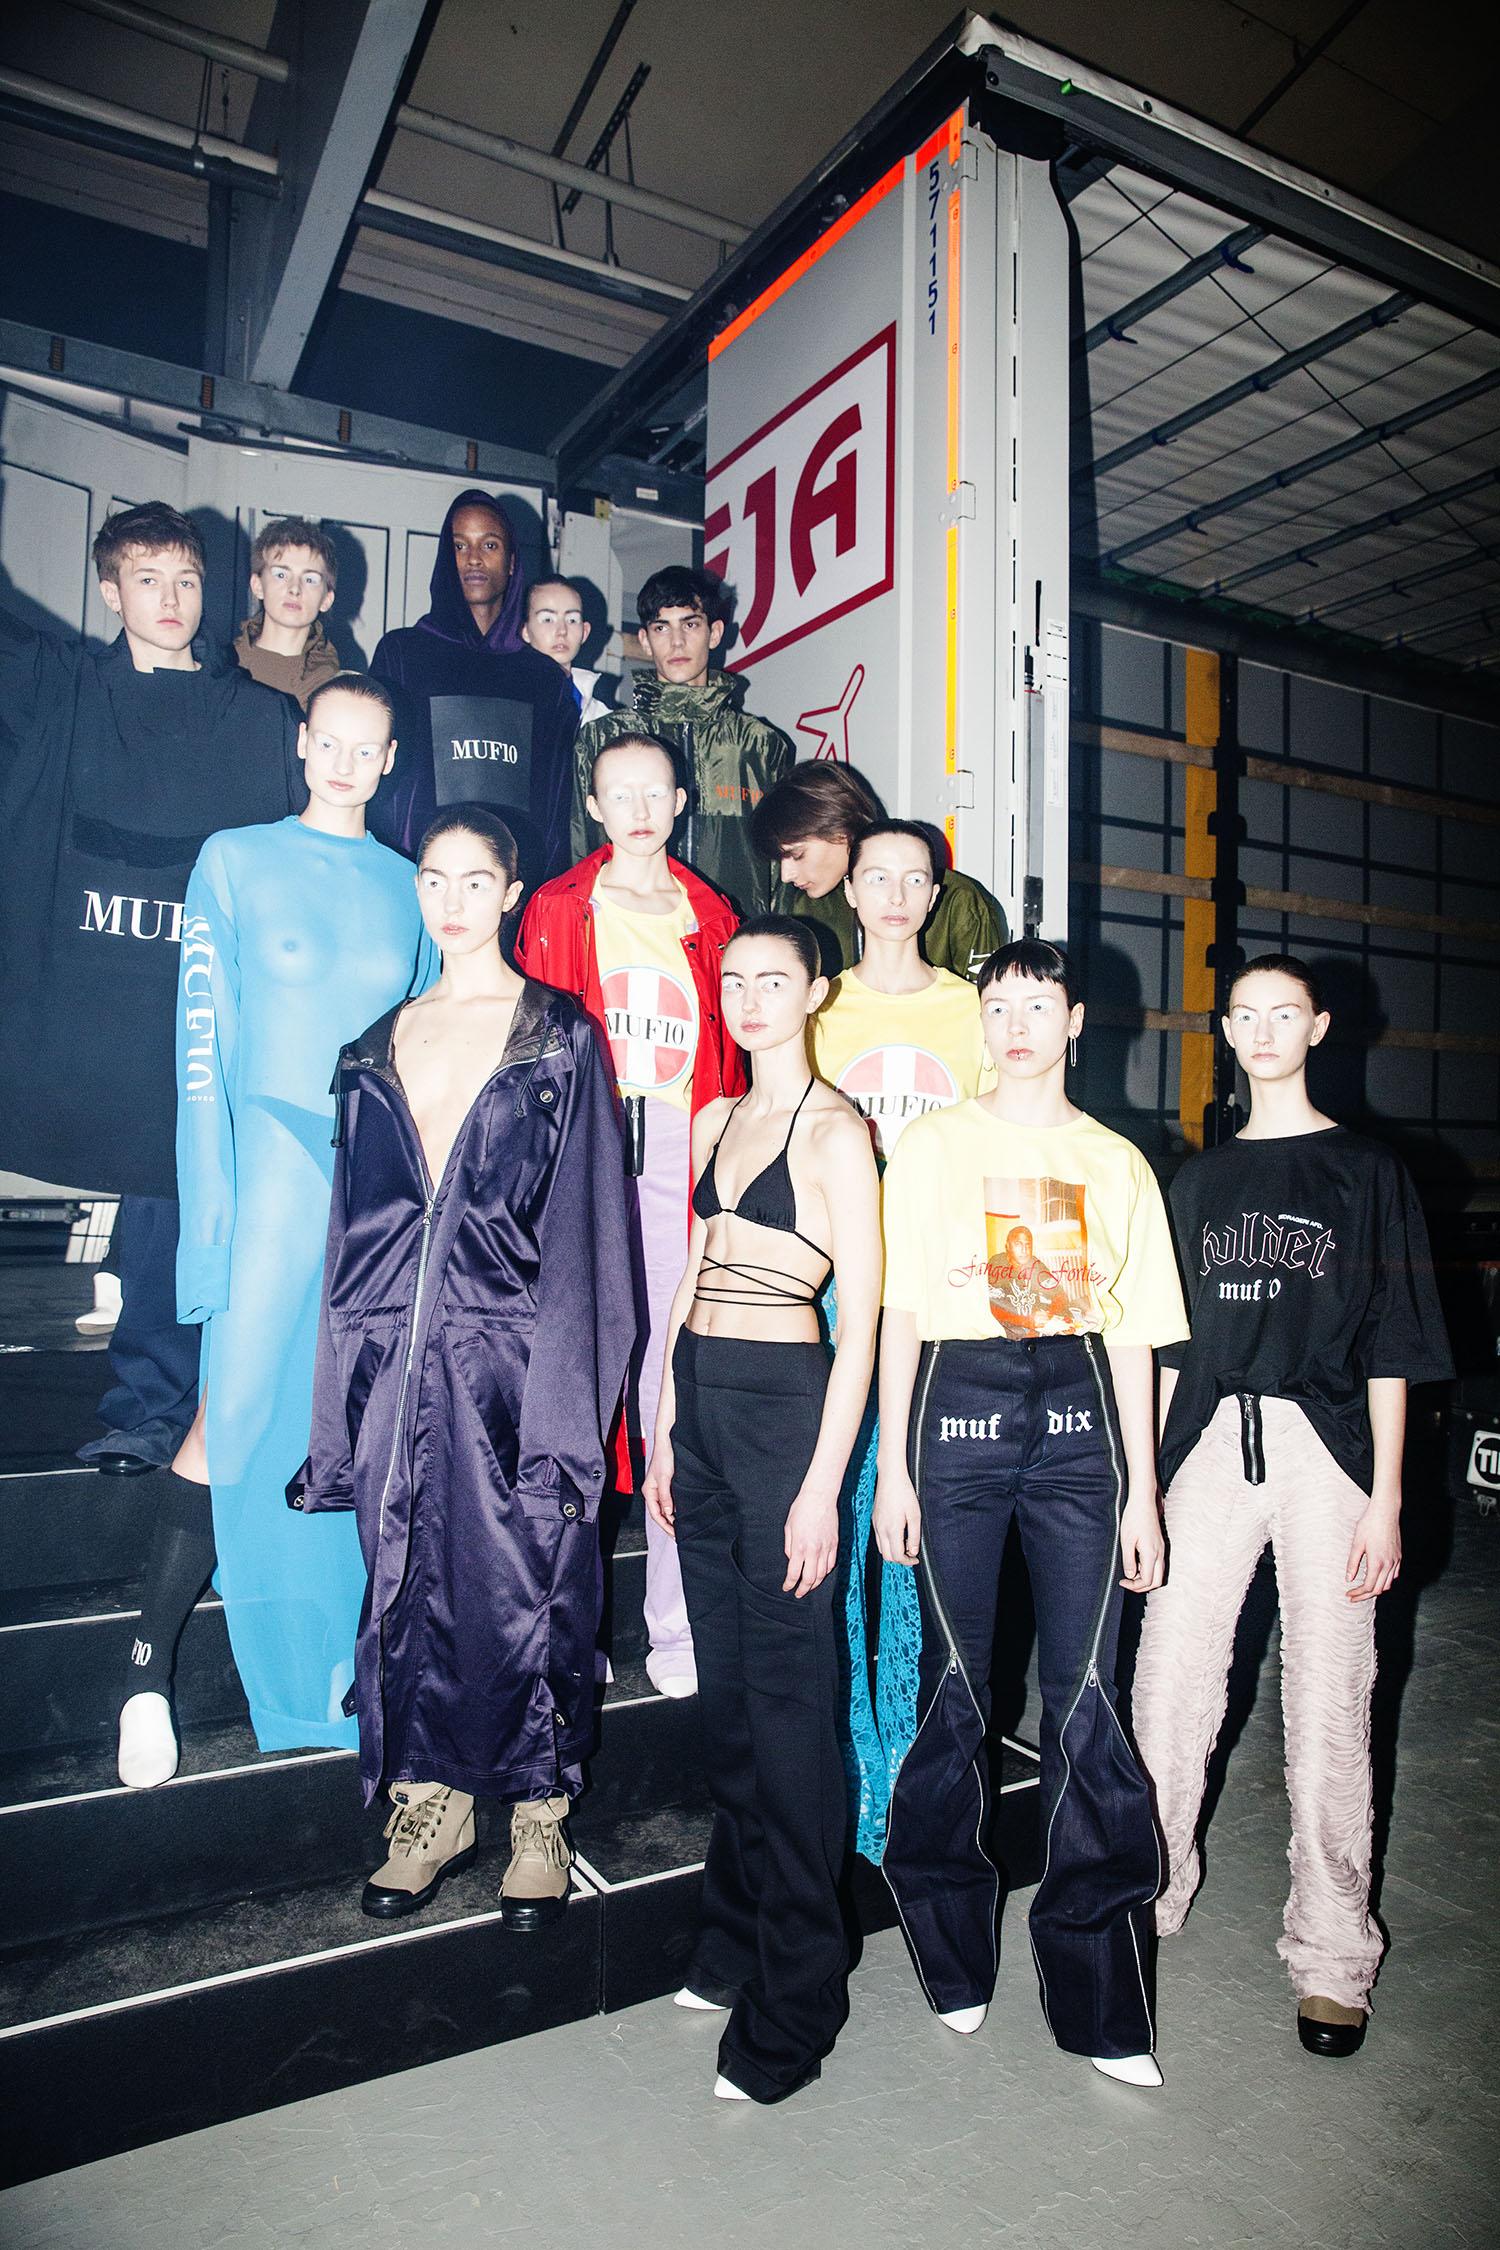 MUF10 AW17 show